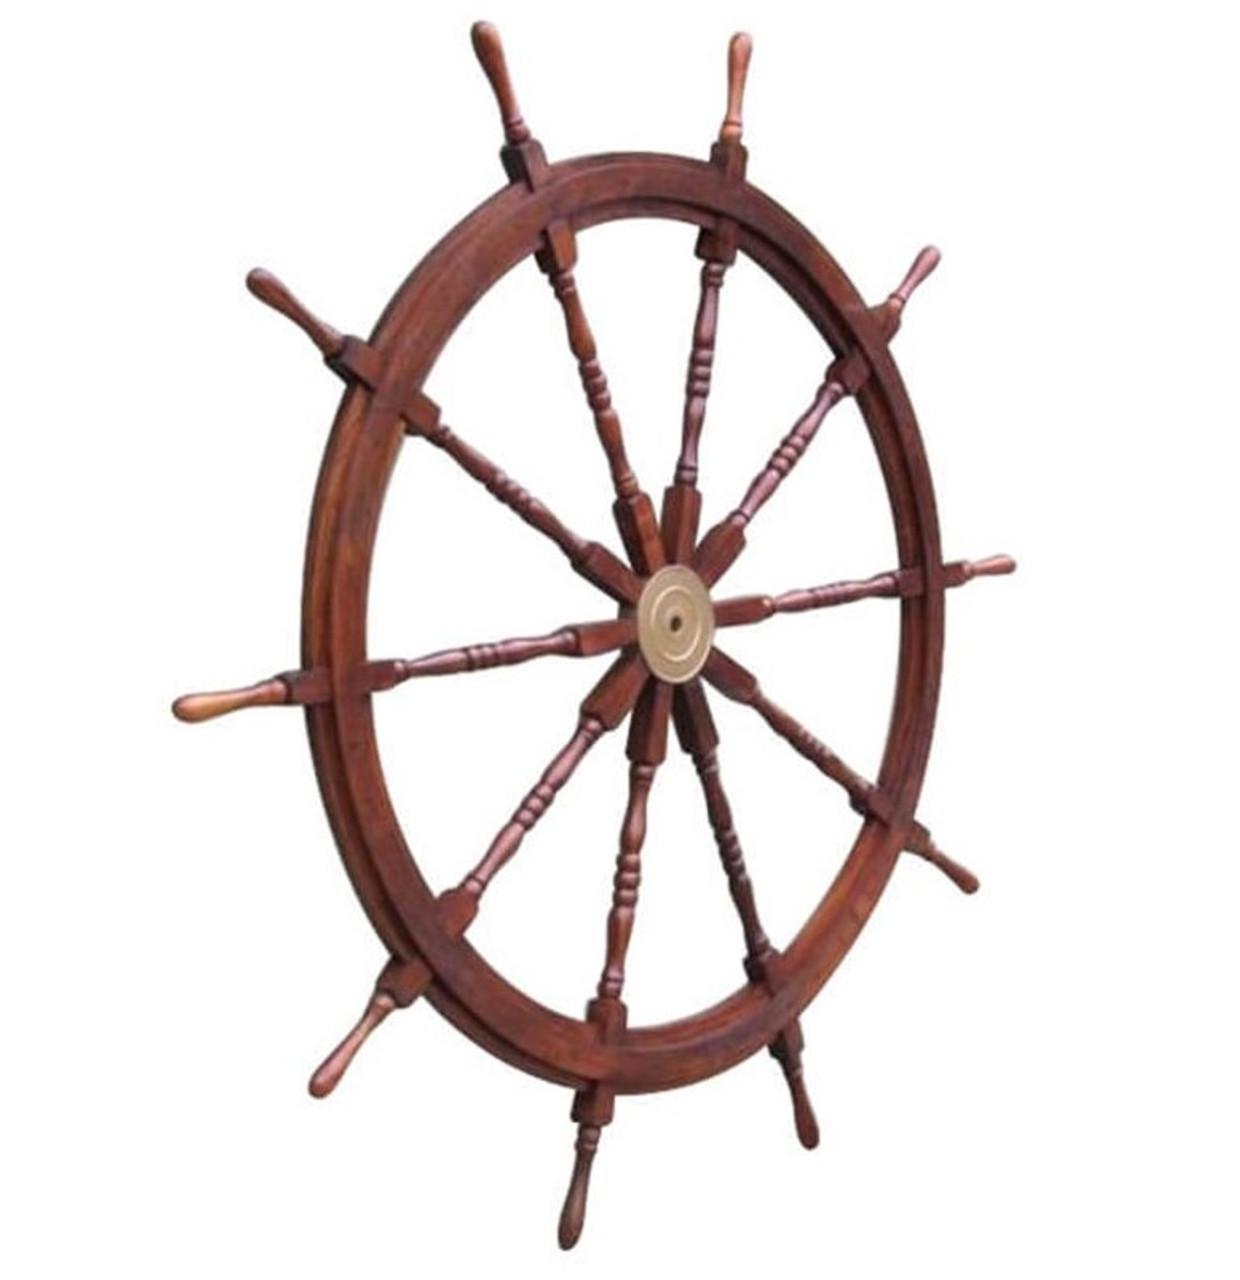 XL Ships Steering Wheel Teak Nautical Yard Decor